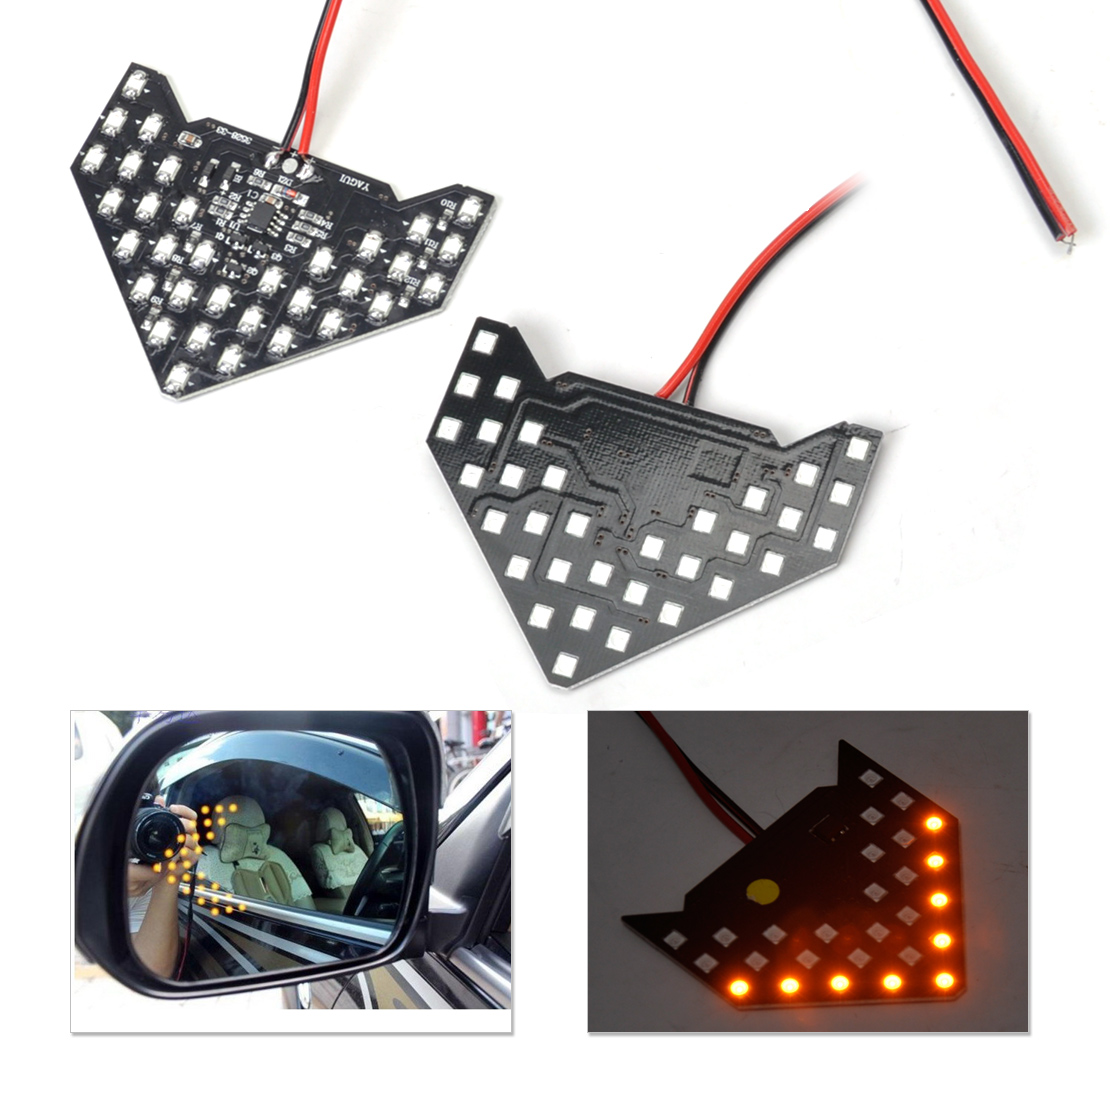 DWCX 2pcs 33 LED Rear View Side Mirror Turn Signal Light For Ford focus VW Golf BMW E46 E90 Audi A4 Nissan Qashqai Kia Rio Cruze комплект адаптеров ford focus 1 audi a4 до 2000